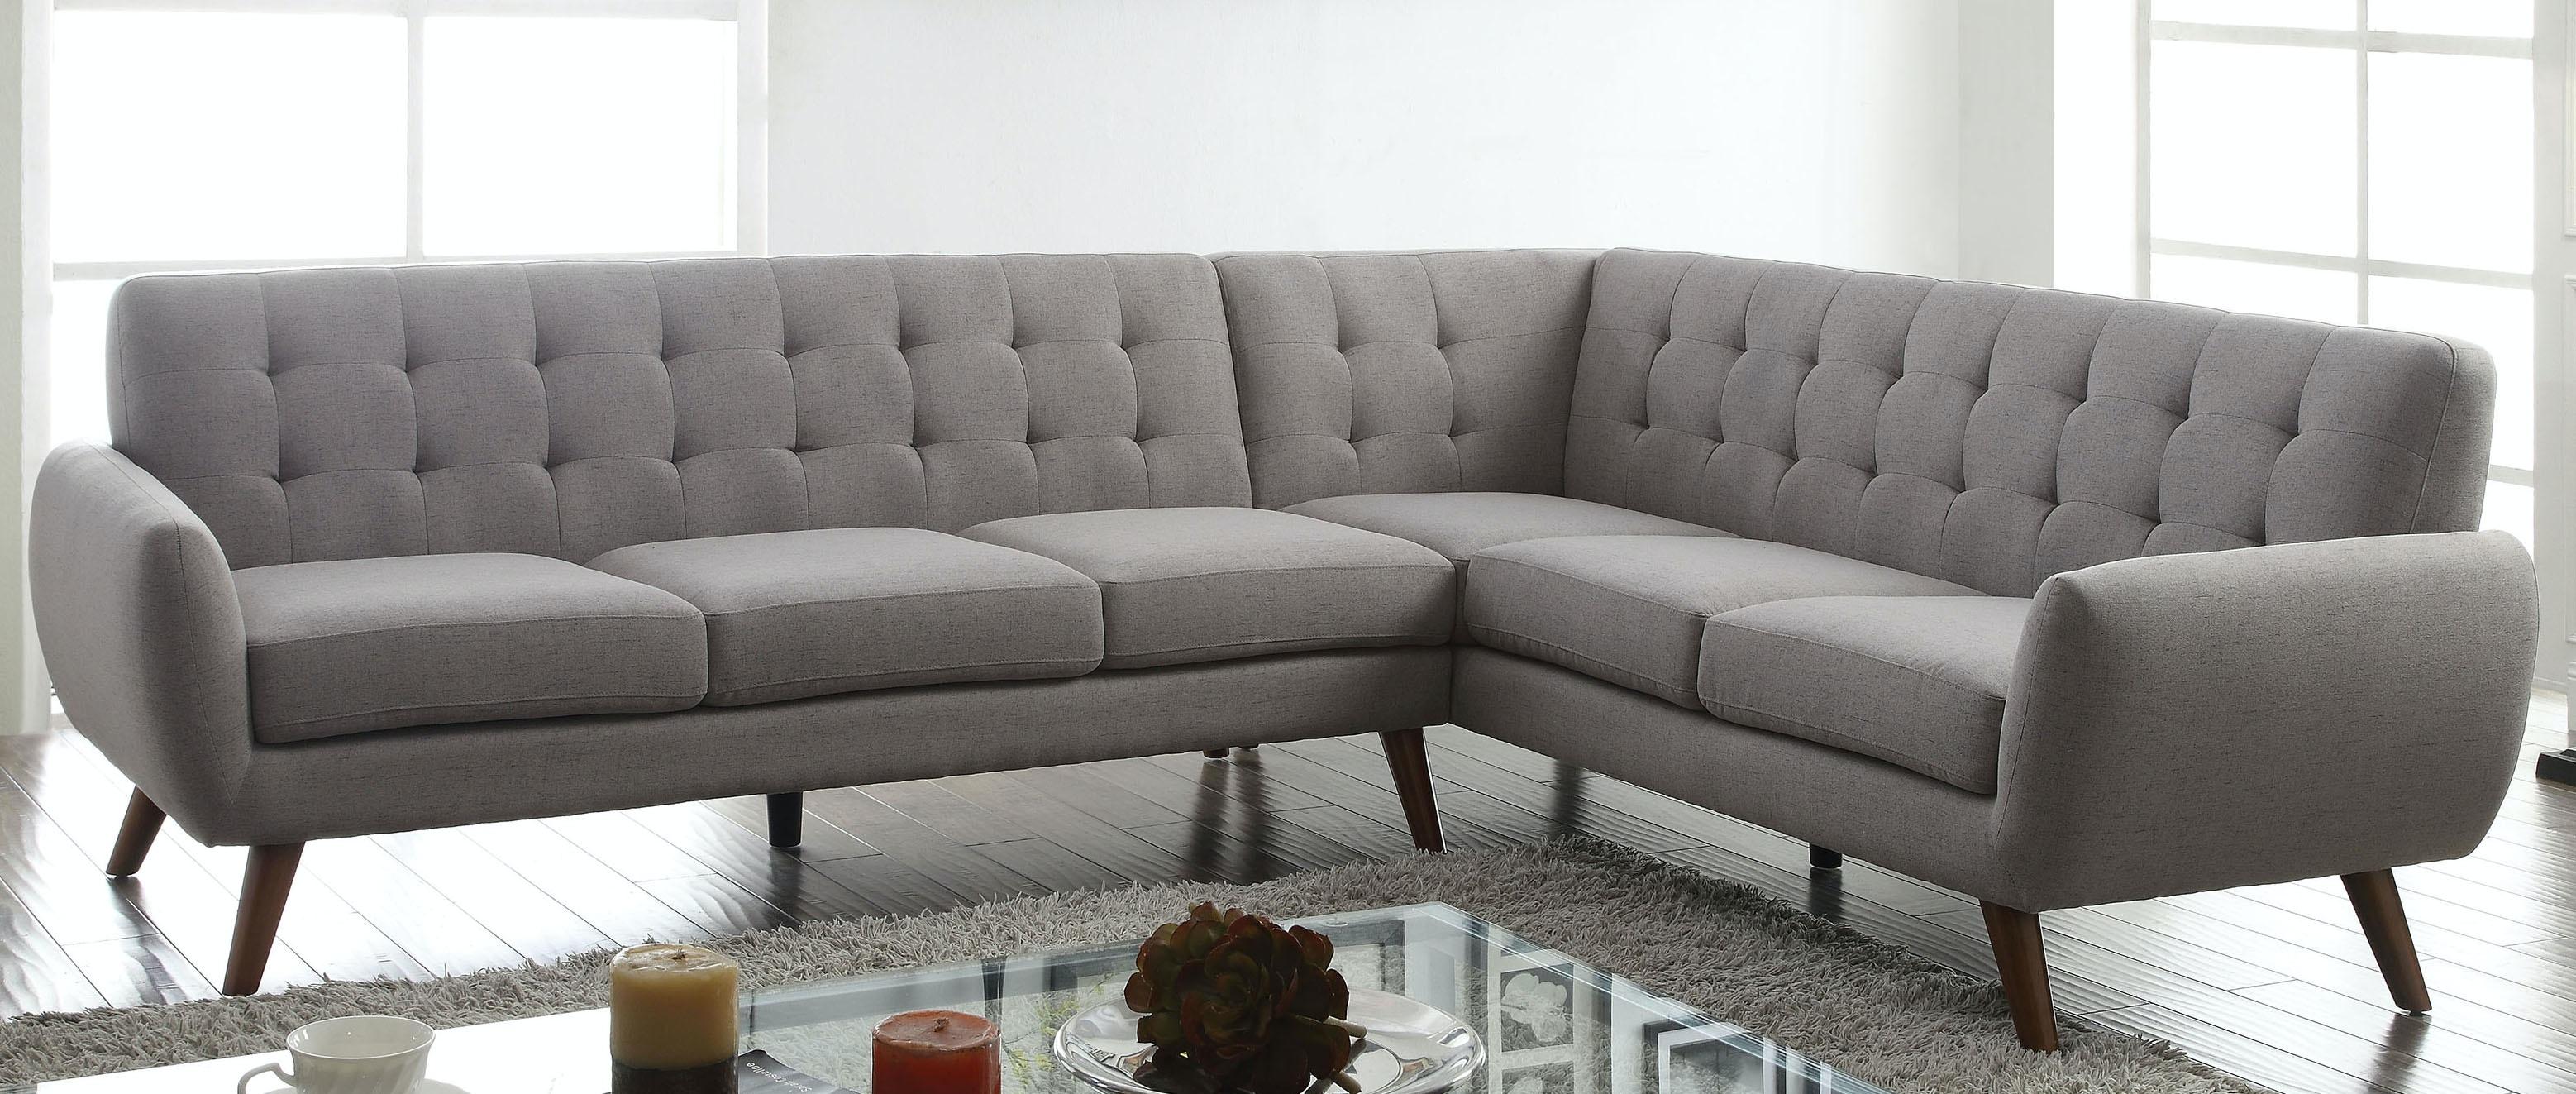 Acme Furniture Essick Sectional Sofa 52765